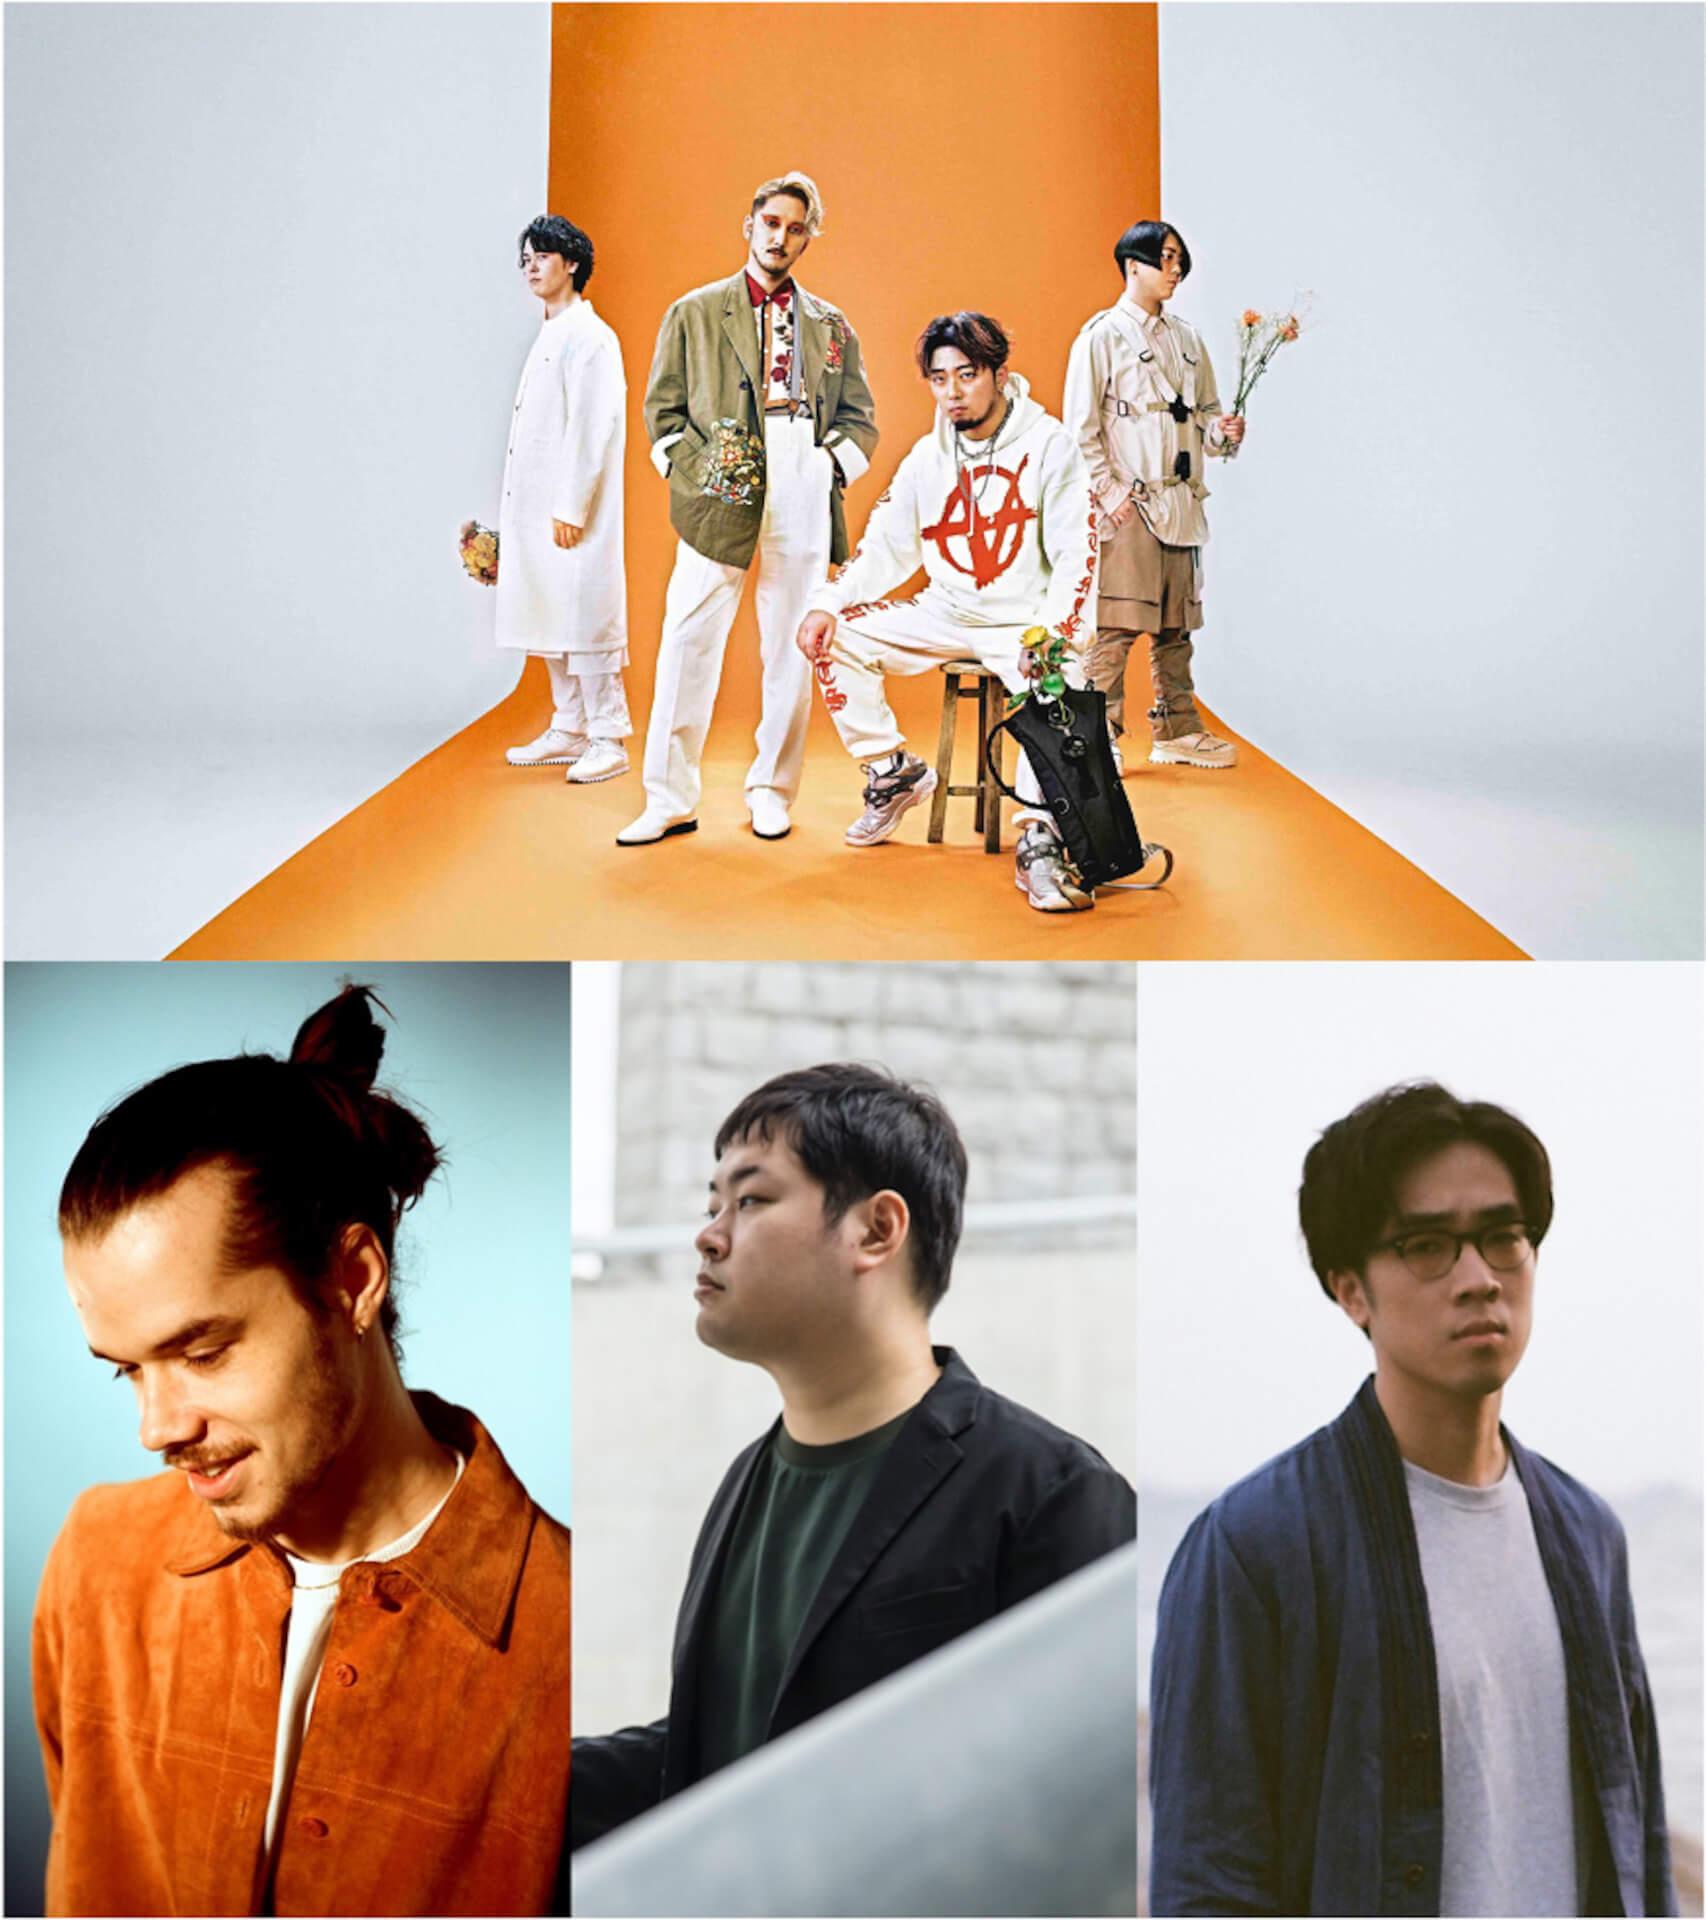 WONK『EYES』のリミックスシリーズが配信決定!坂東祐大、Oscar Jerome、Charlie Limが参加 music210609_wonk_remix_1